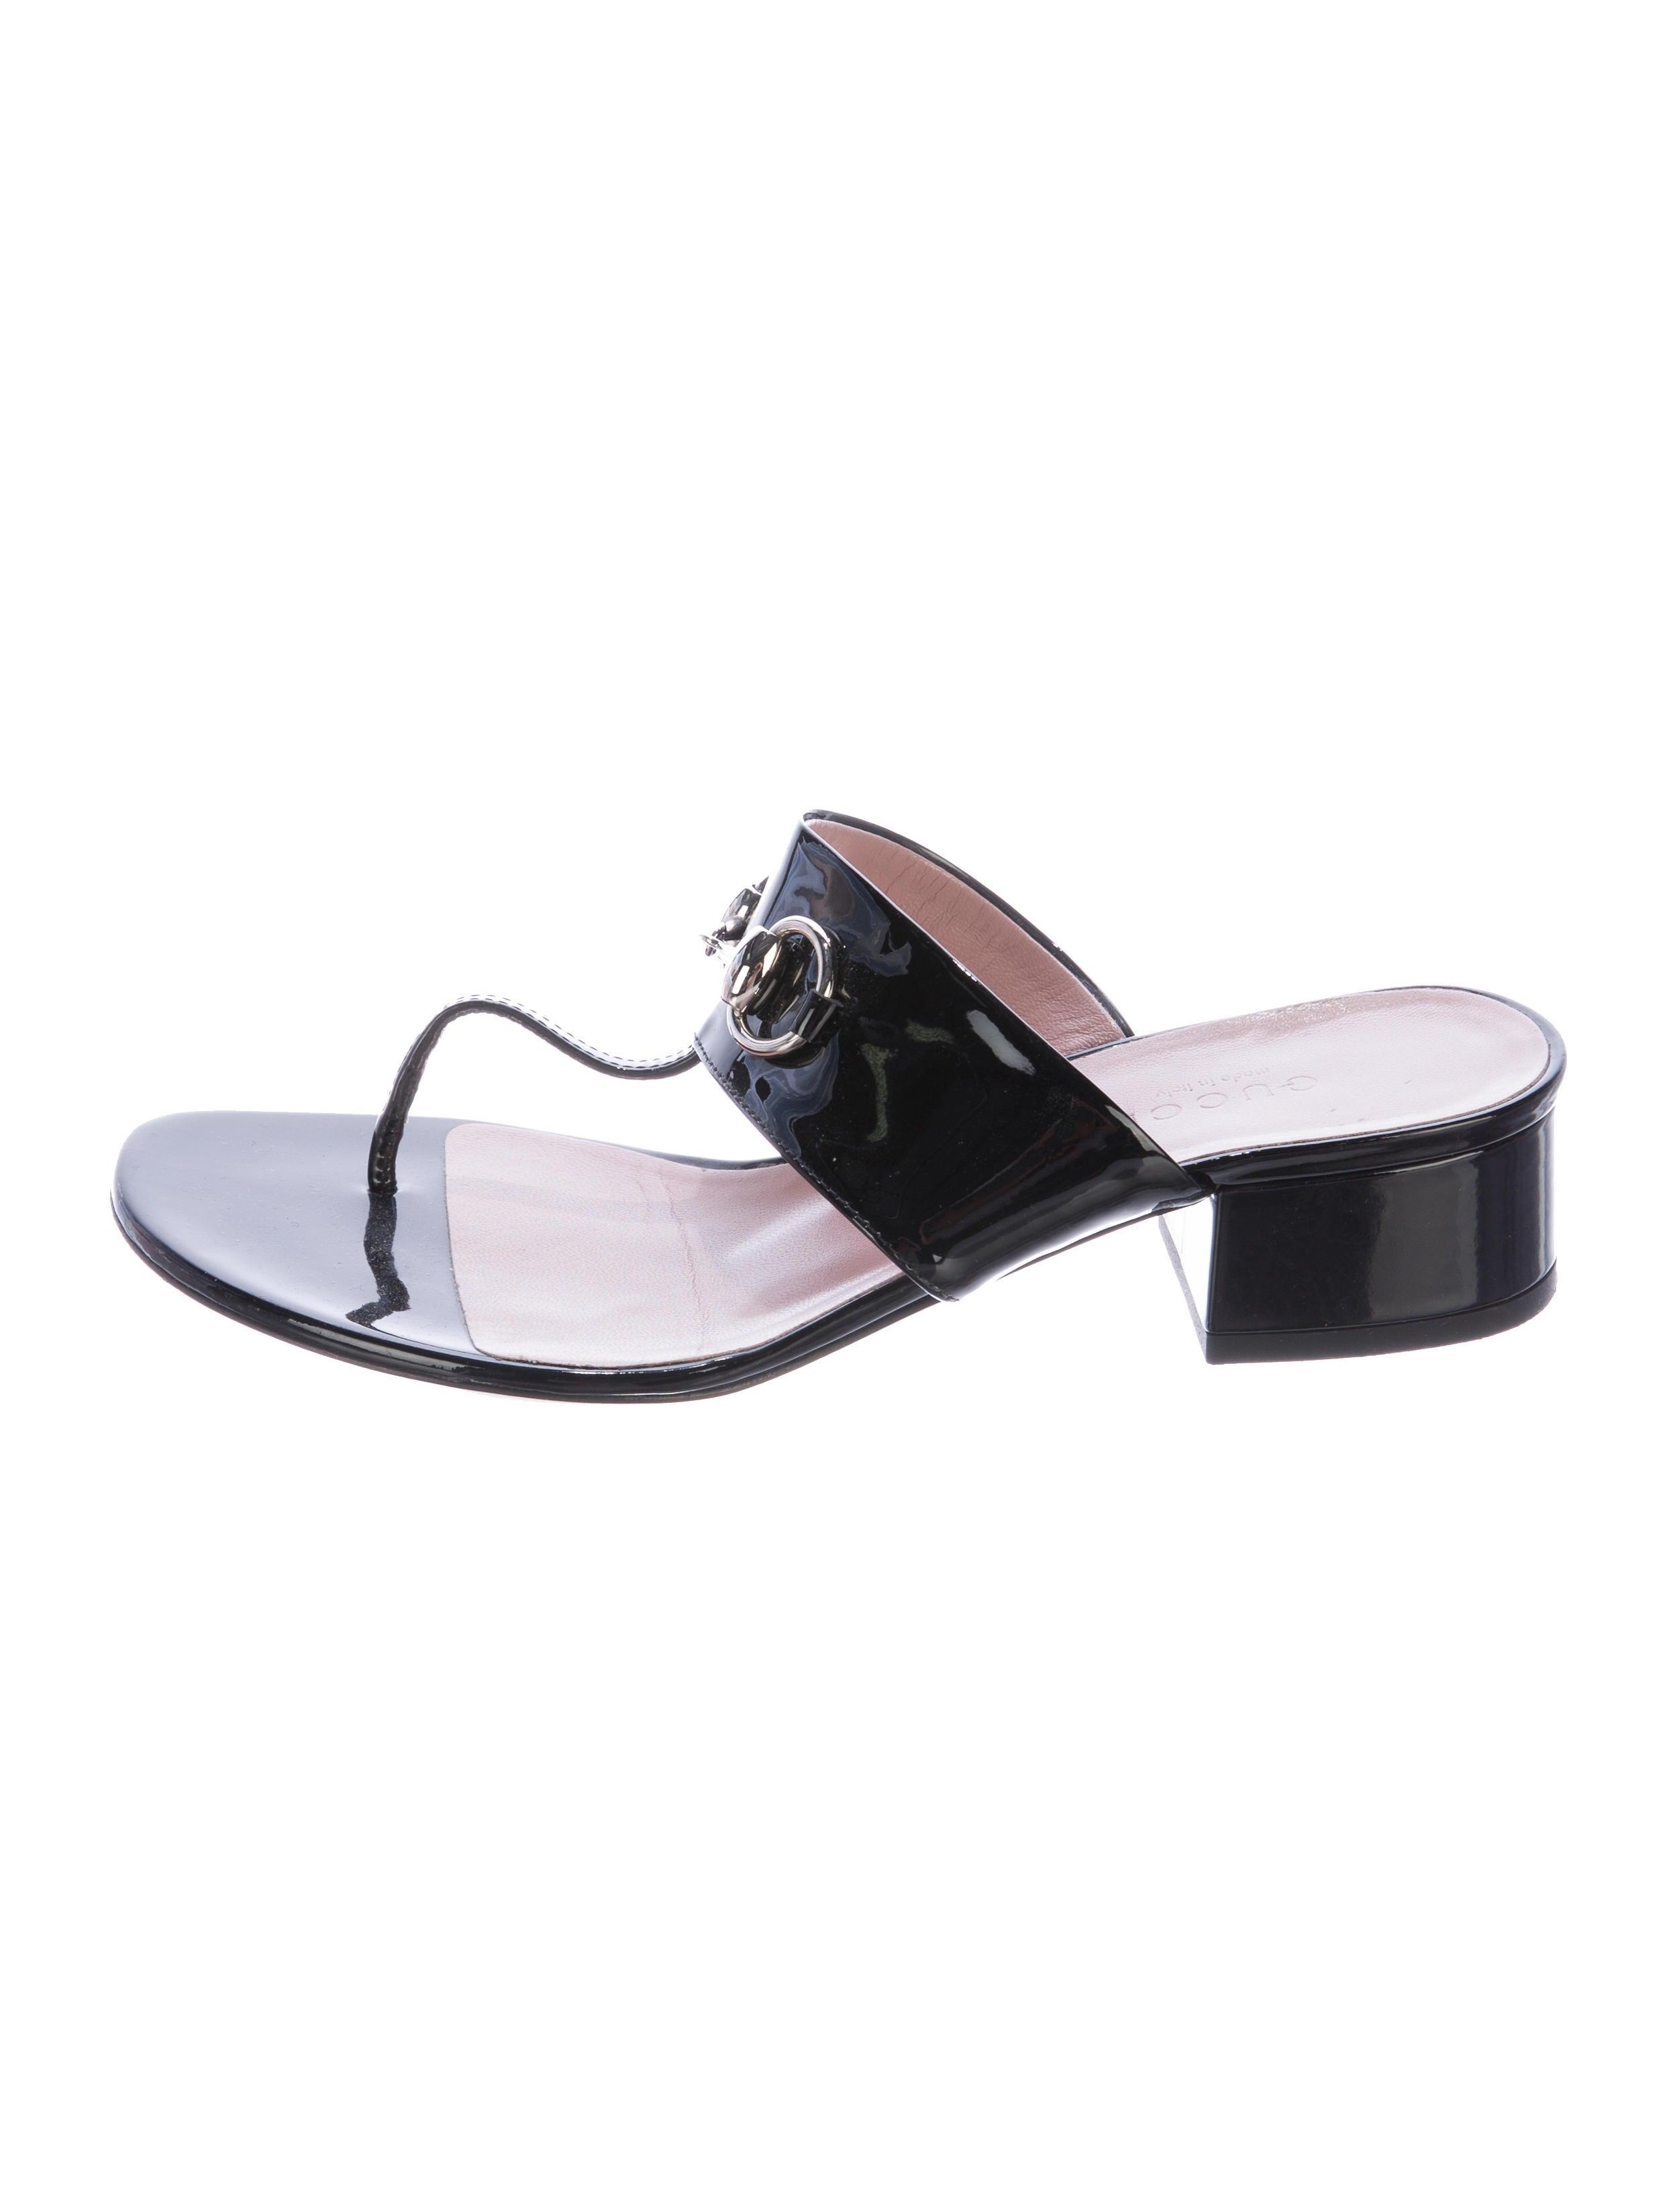 5d11802f76db Gucci Horsebit Thong Sandals - Shoes - GUC146440